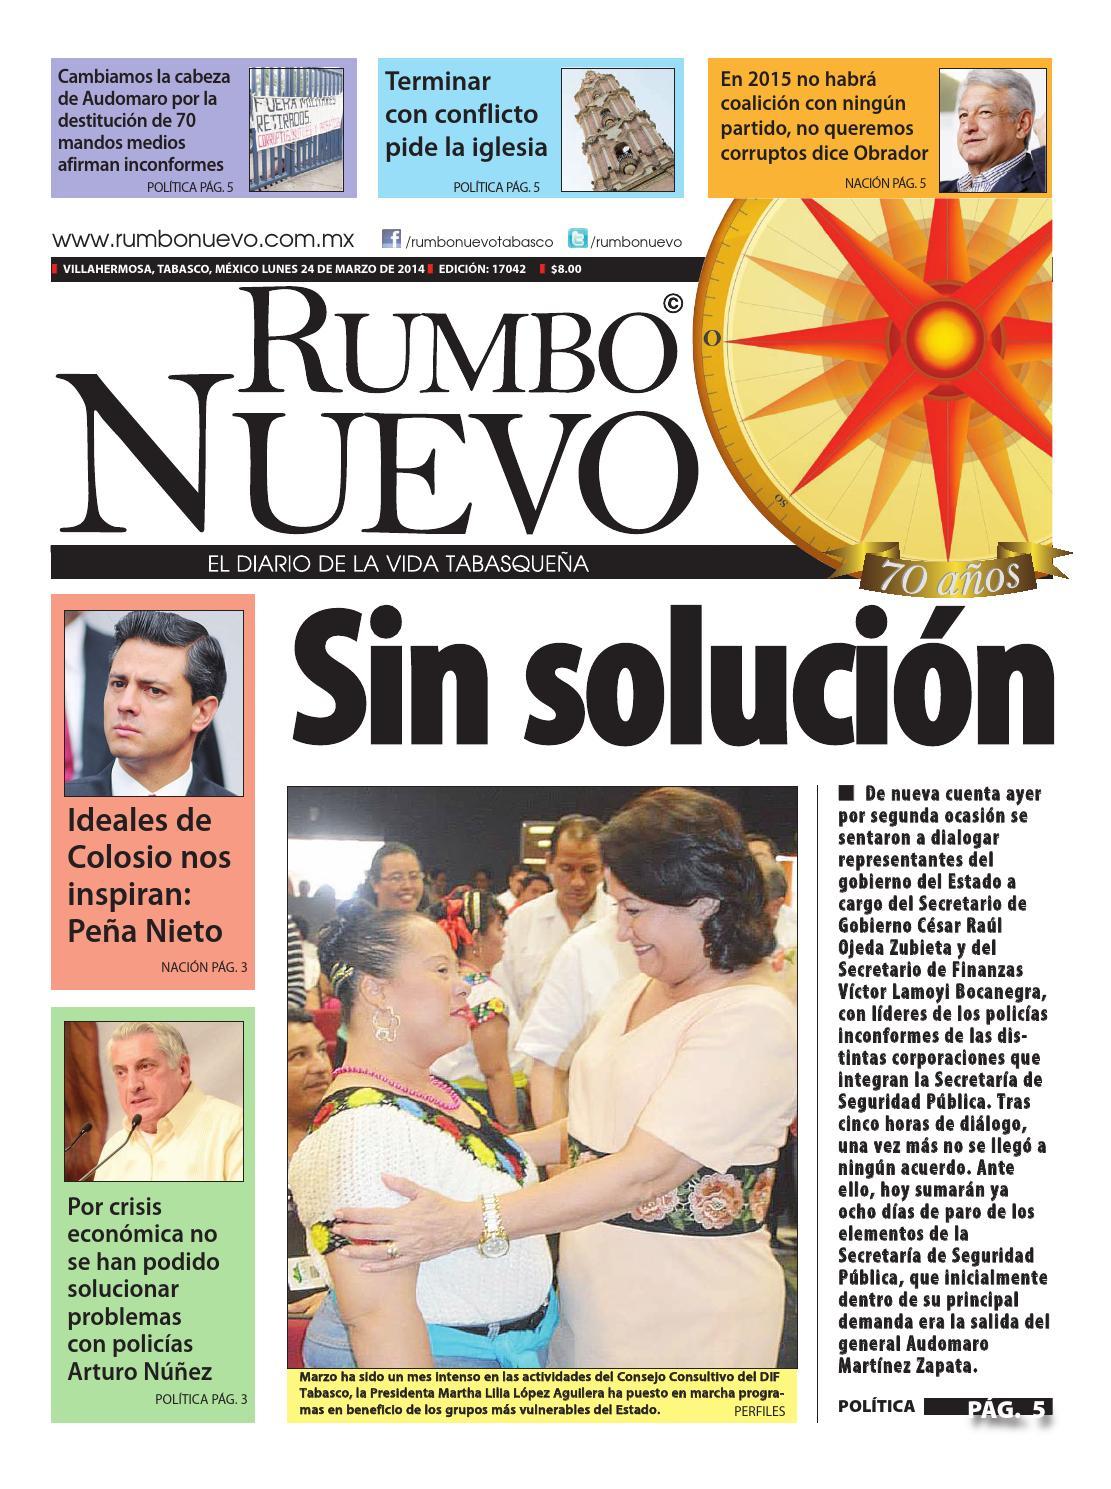 Principal lunes 24 de marzo 2014 by Grupo Rumbo Nuevo - issuu